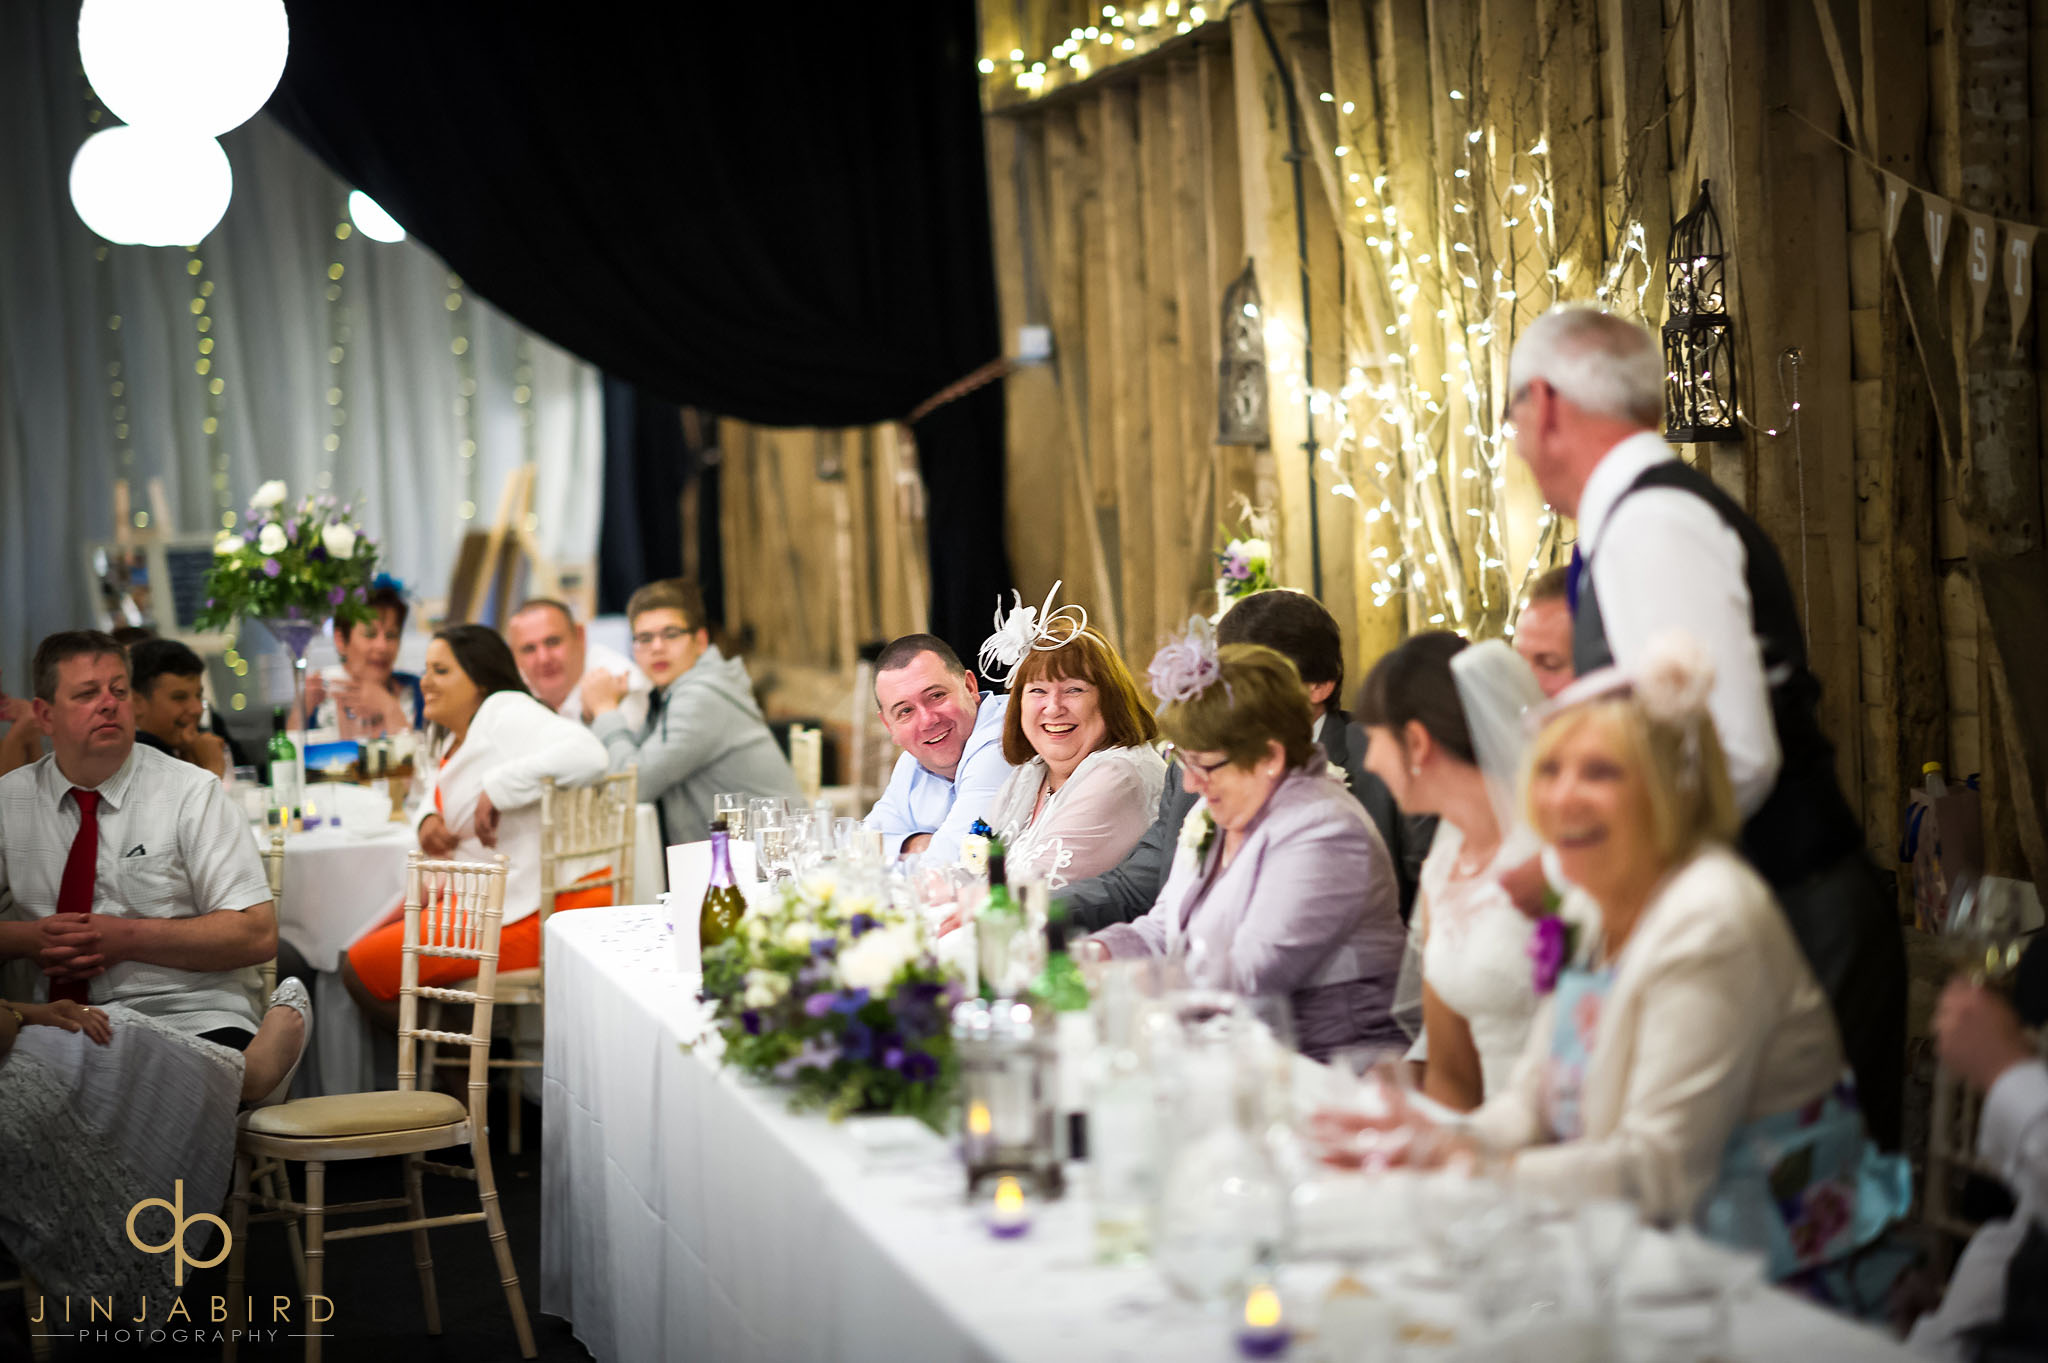 childerley hall wedding meal